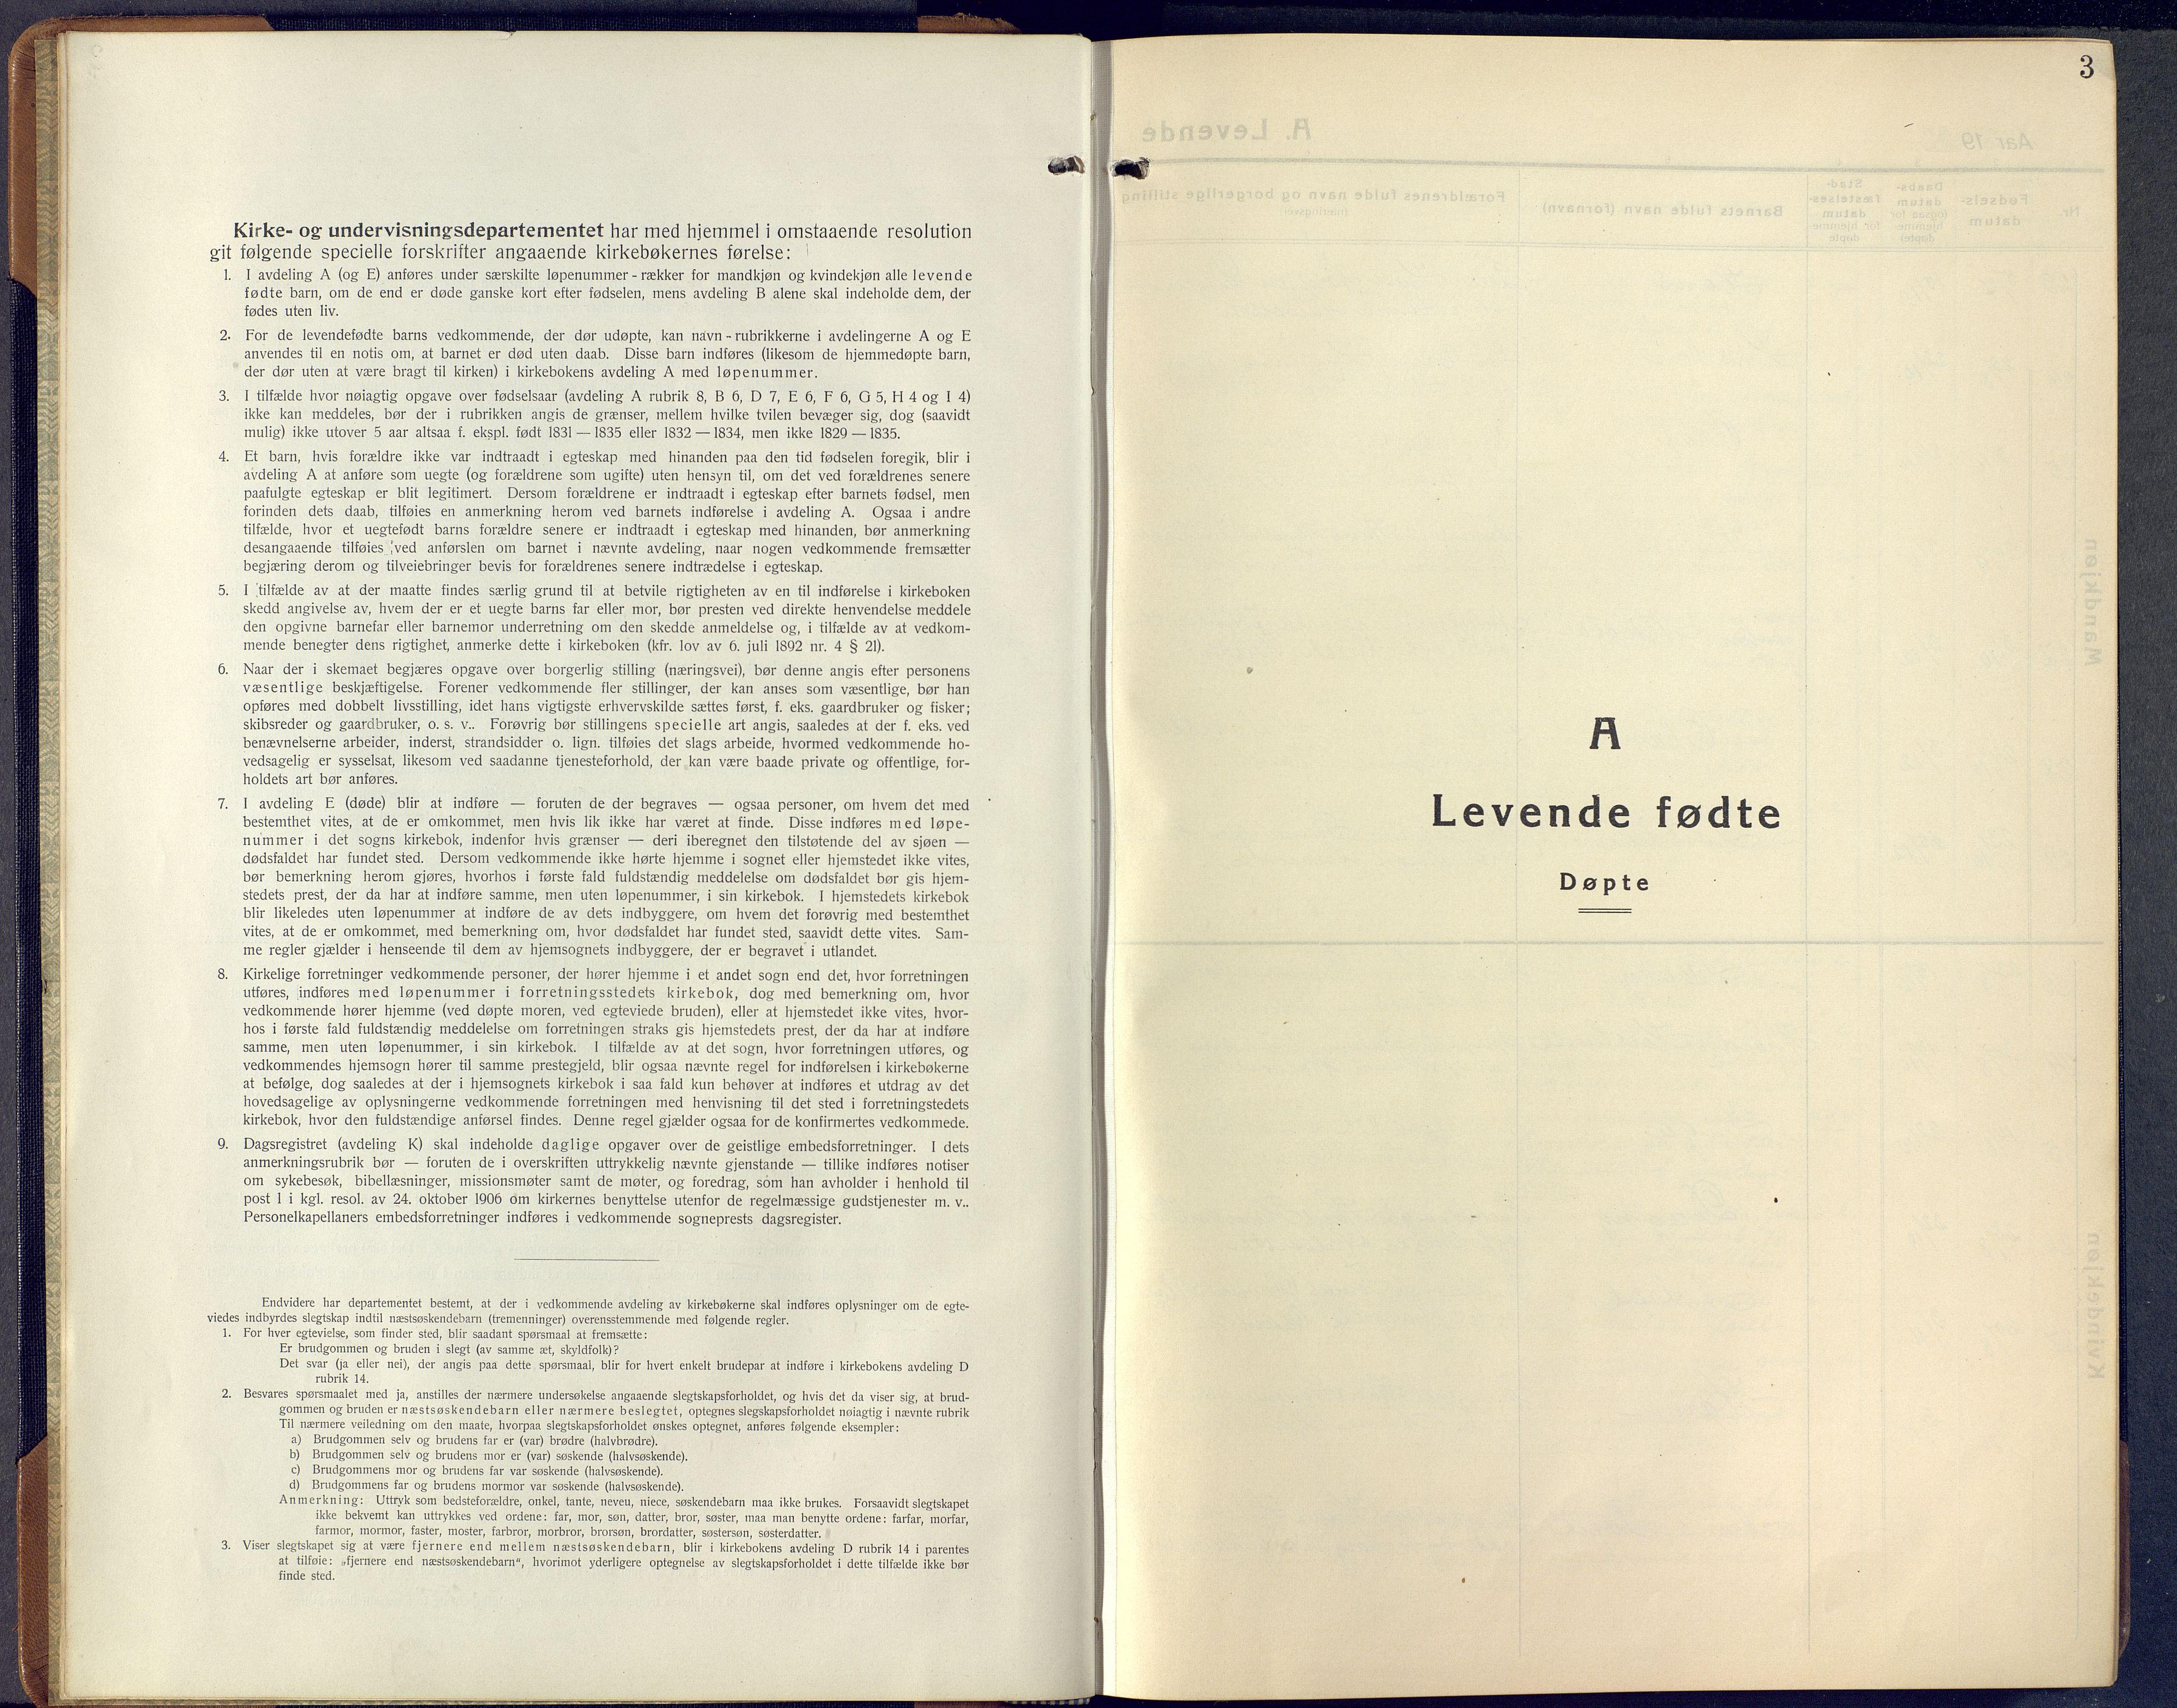 SAKO, Lunde kirkebøker, F/Fa/L0006: Ministerialbok nr. I 6, 1922-1940, s. 3